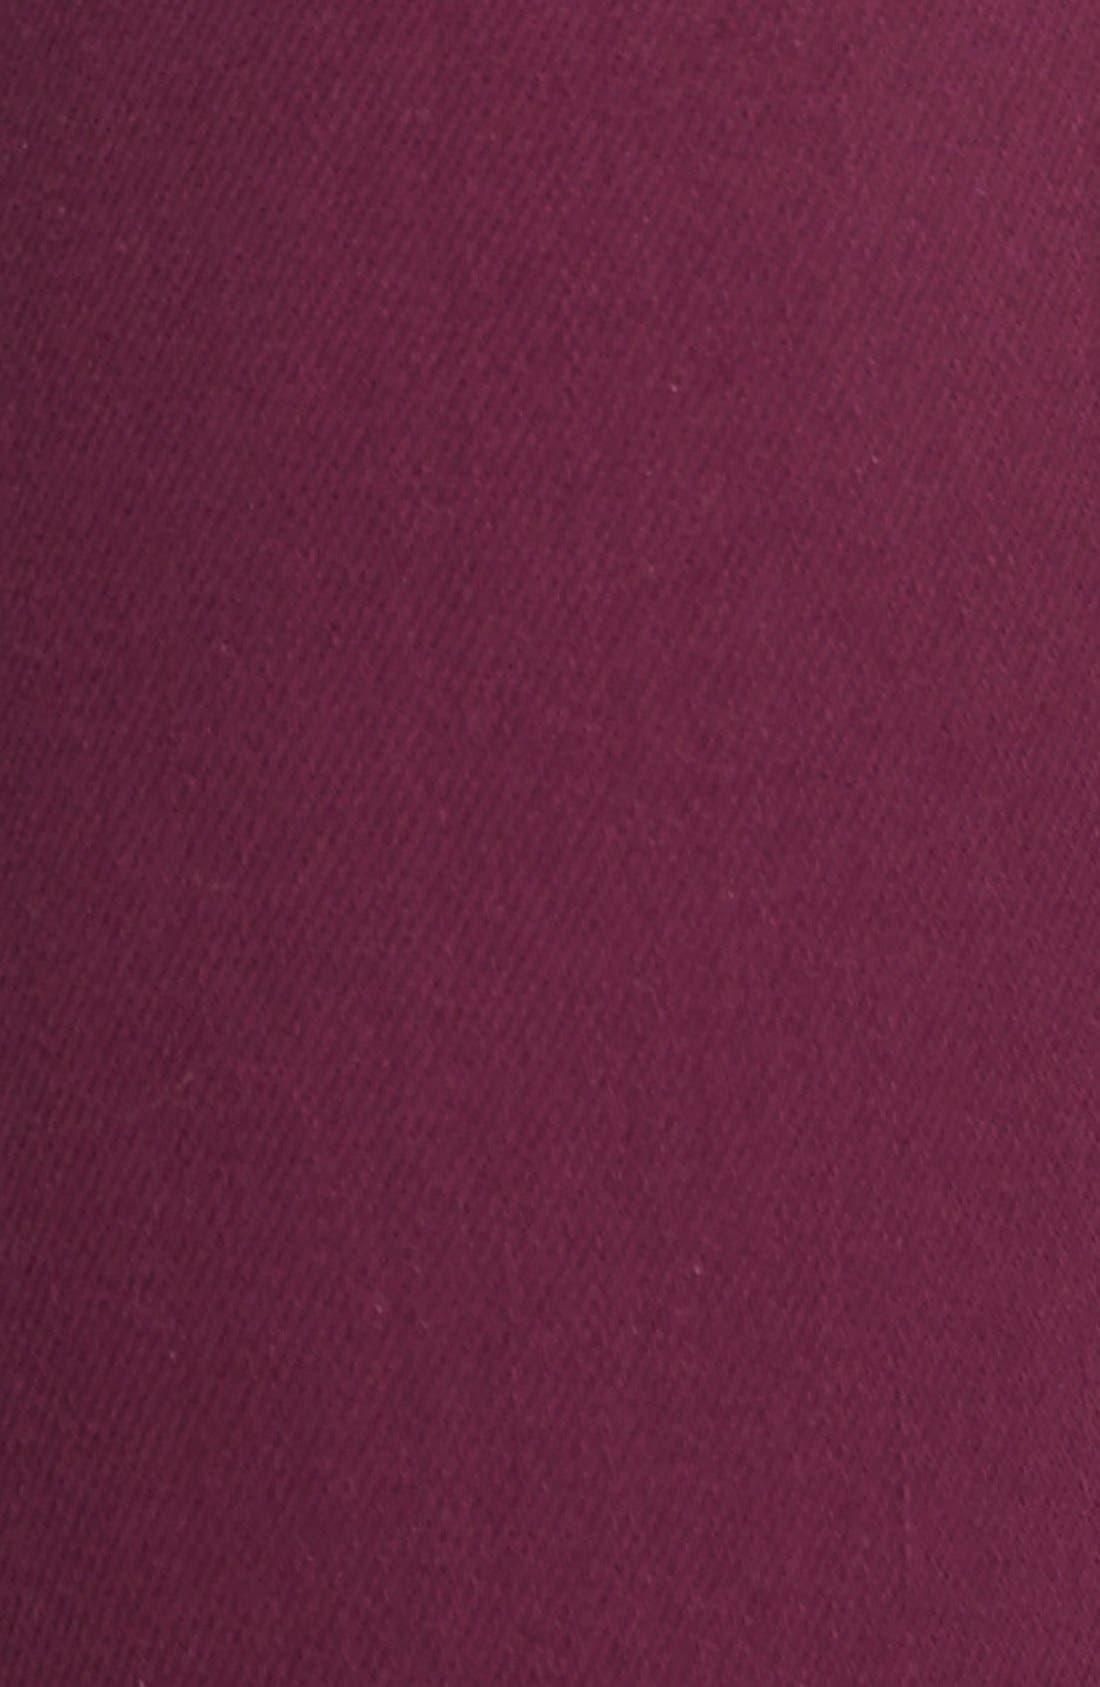 Alternate Image 3  - Paige Denim 'Hoxton' Ultra Skinny Jeans (Passion Plum)